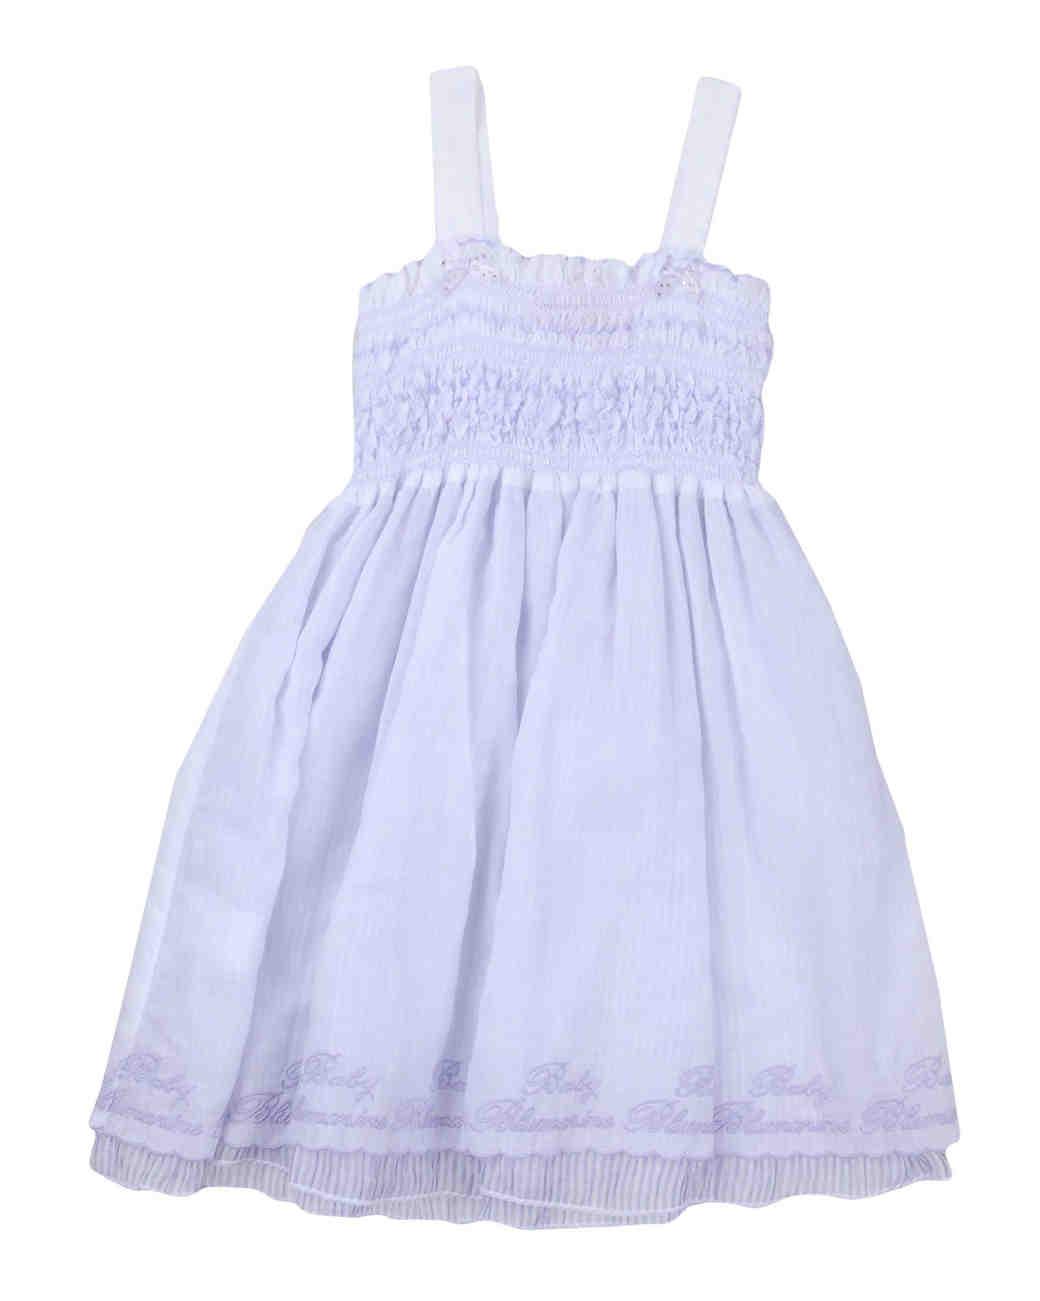 22 Pale Purple Flower Girl Dresses For Any Season Martha Stewart